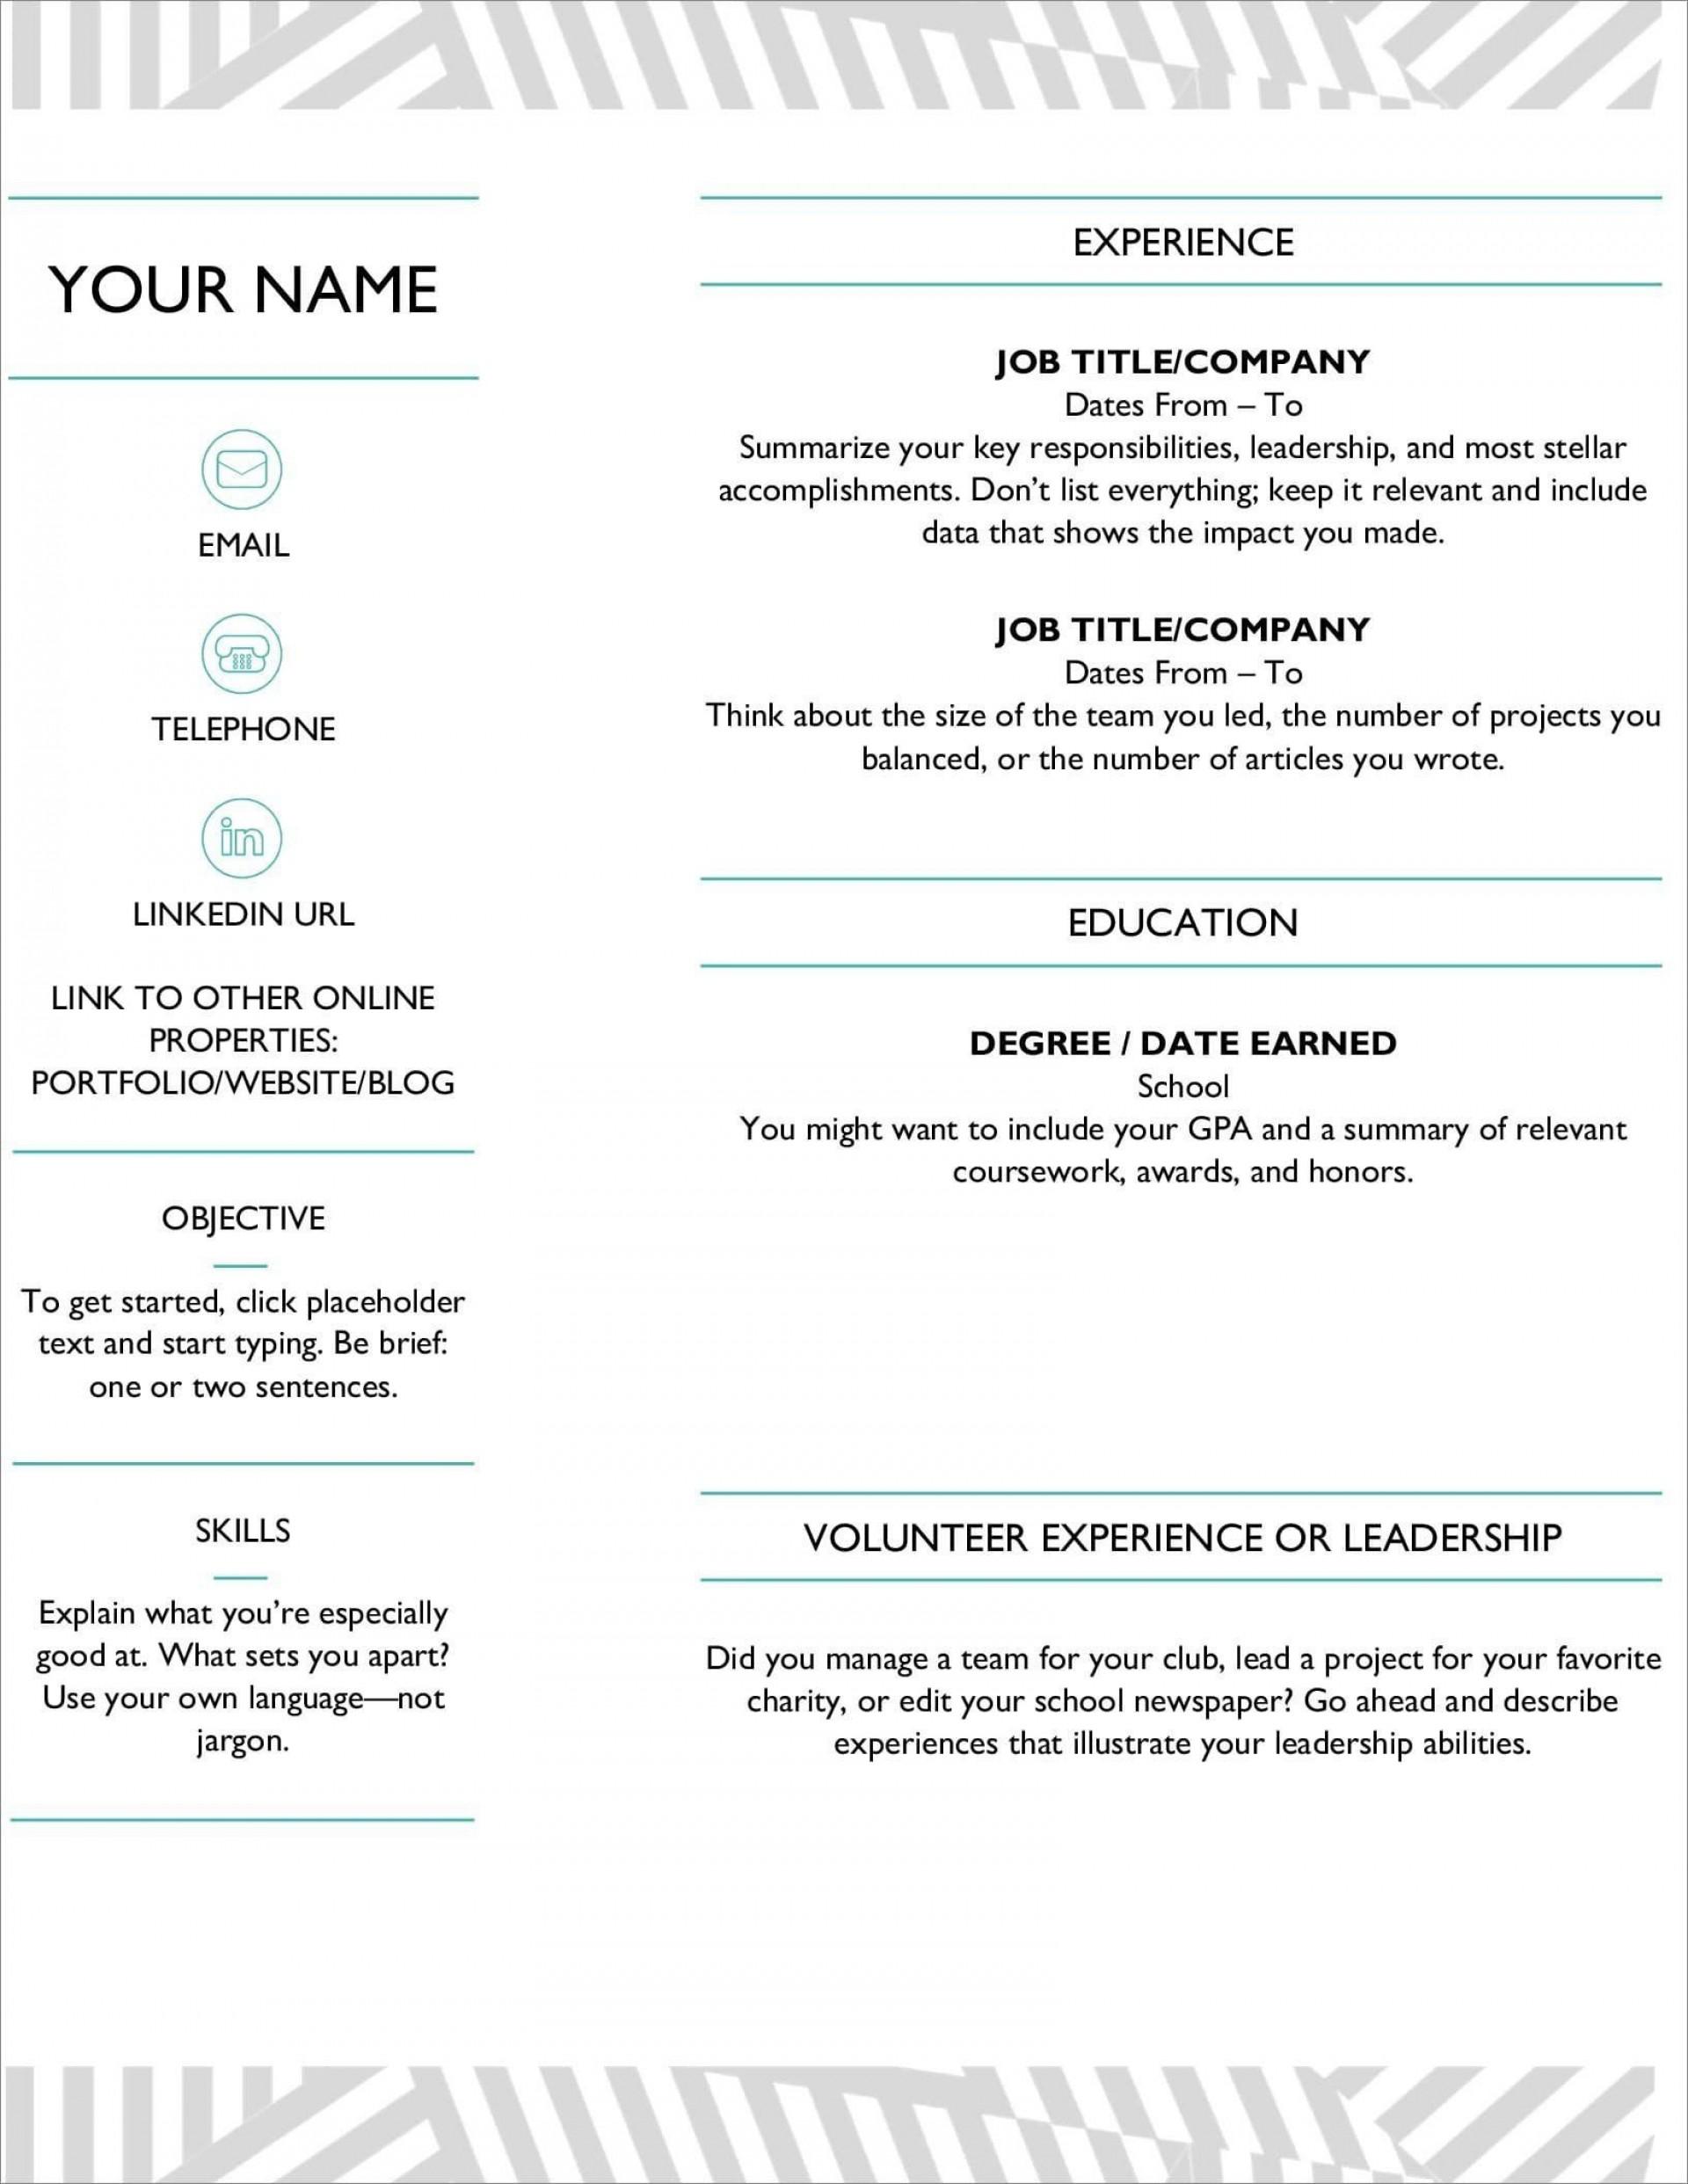 009 Phenomenal Free Professional Resume Template Microsoft Word Example  Cv 20101920